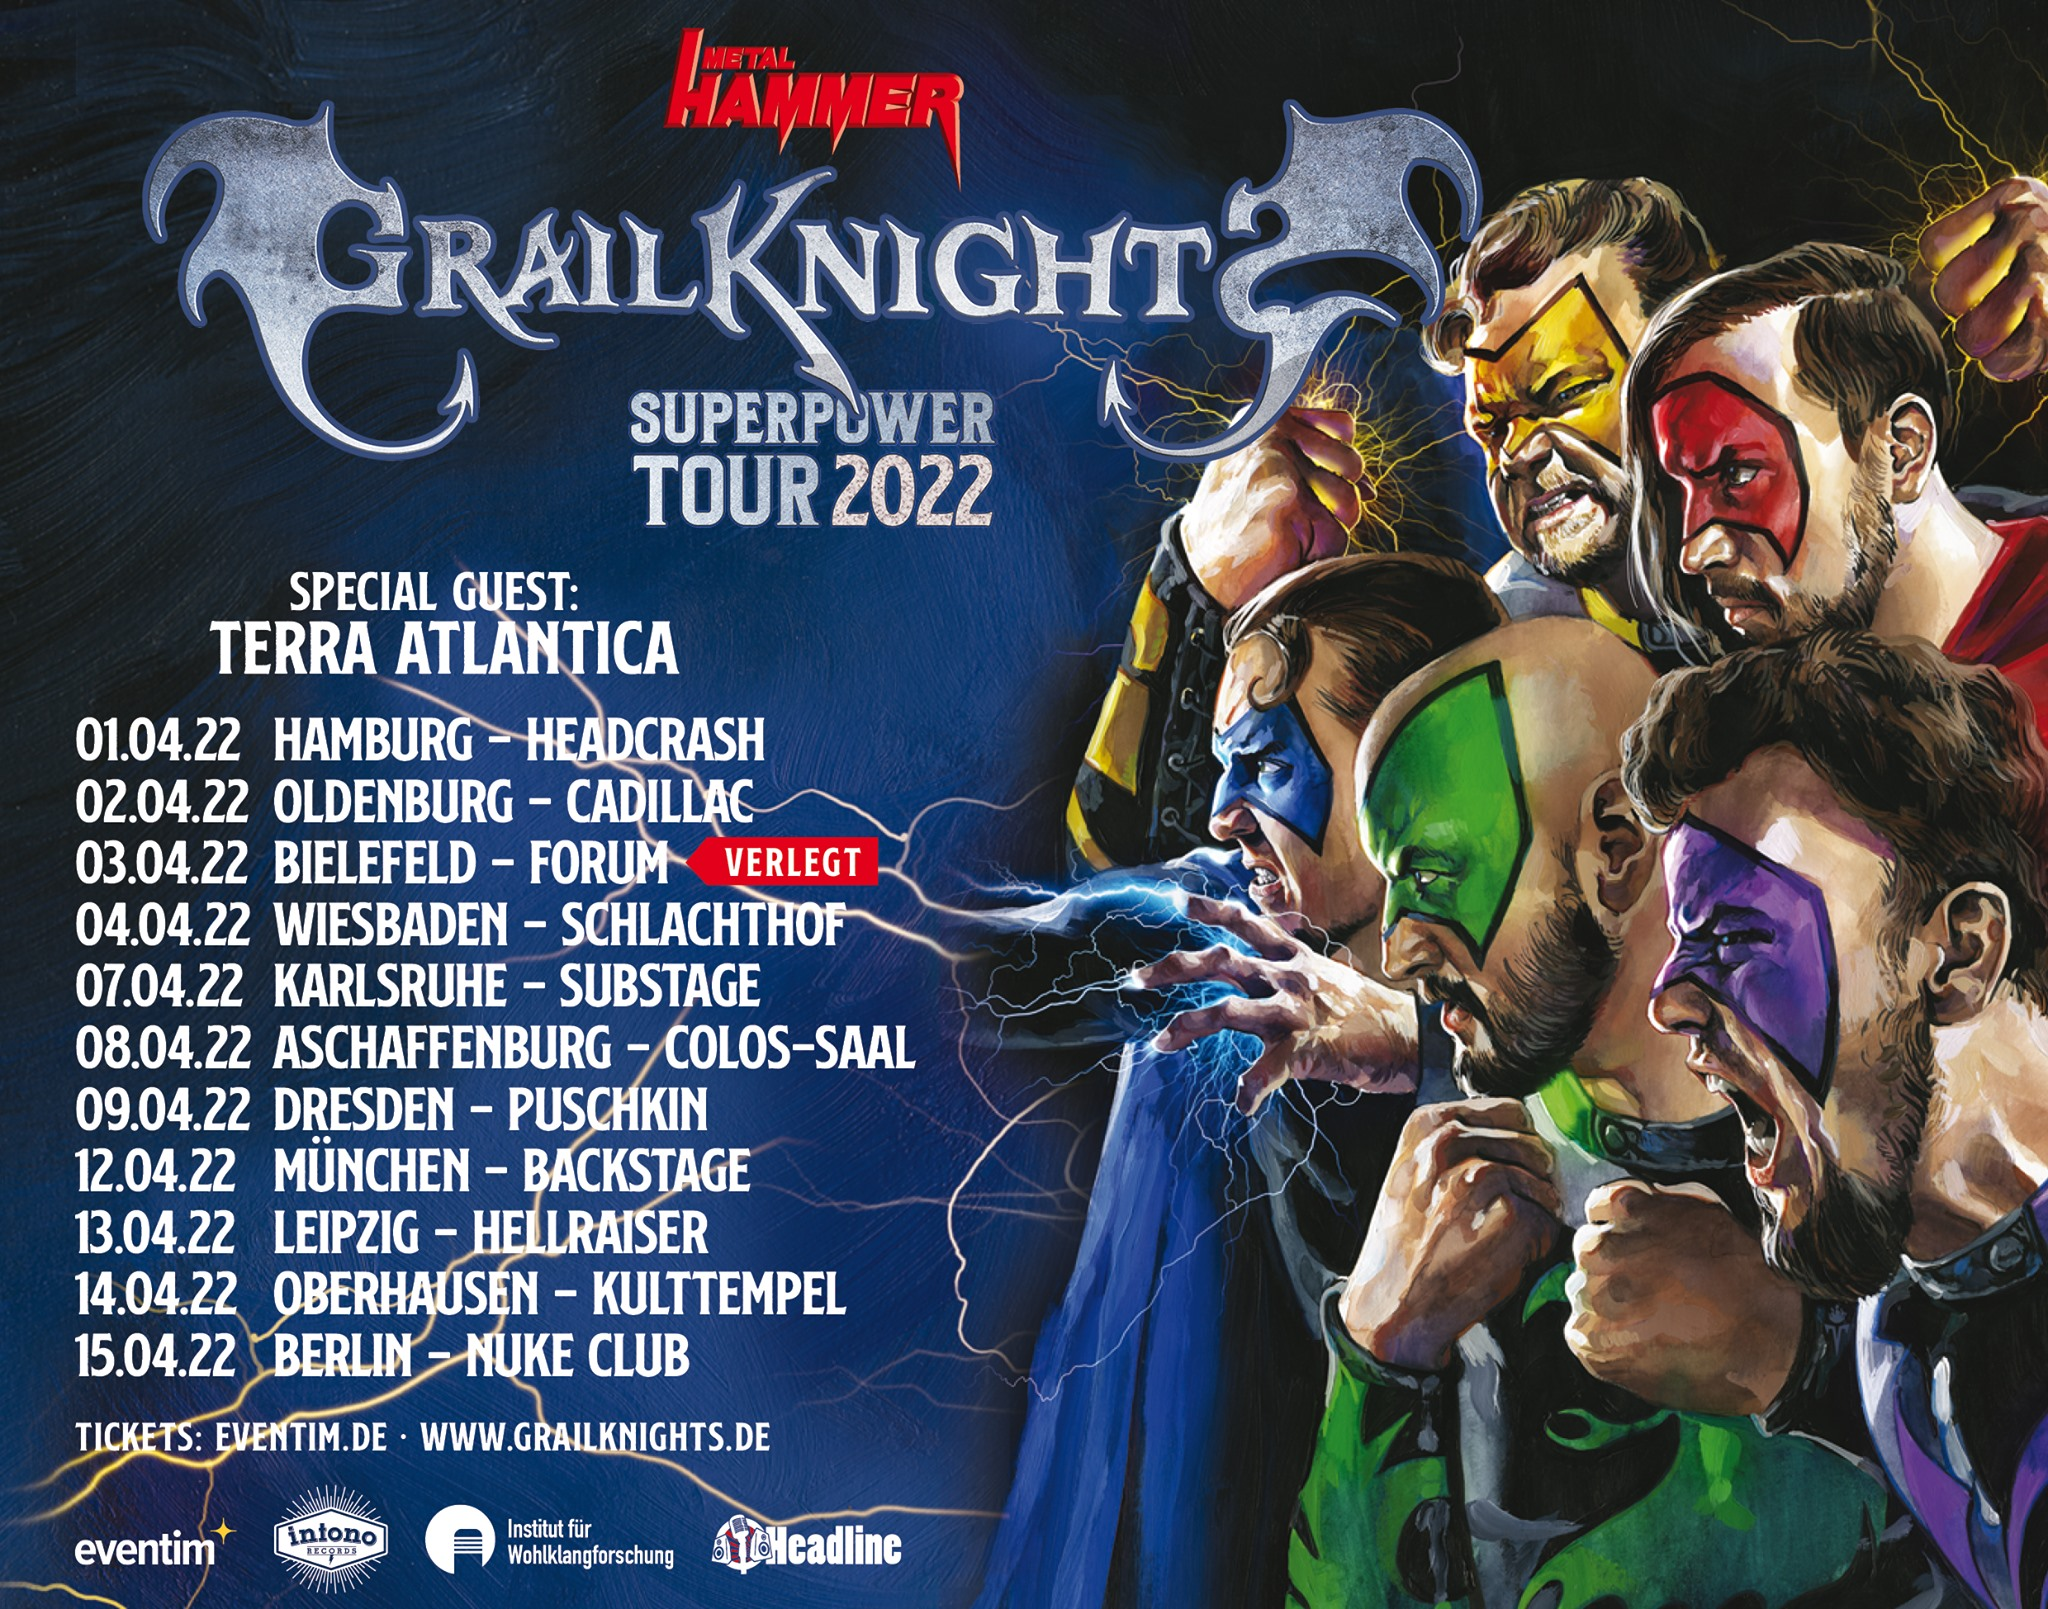 Grailknights Tourplakat 2022